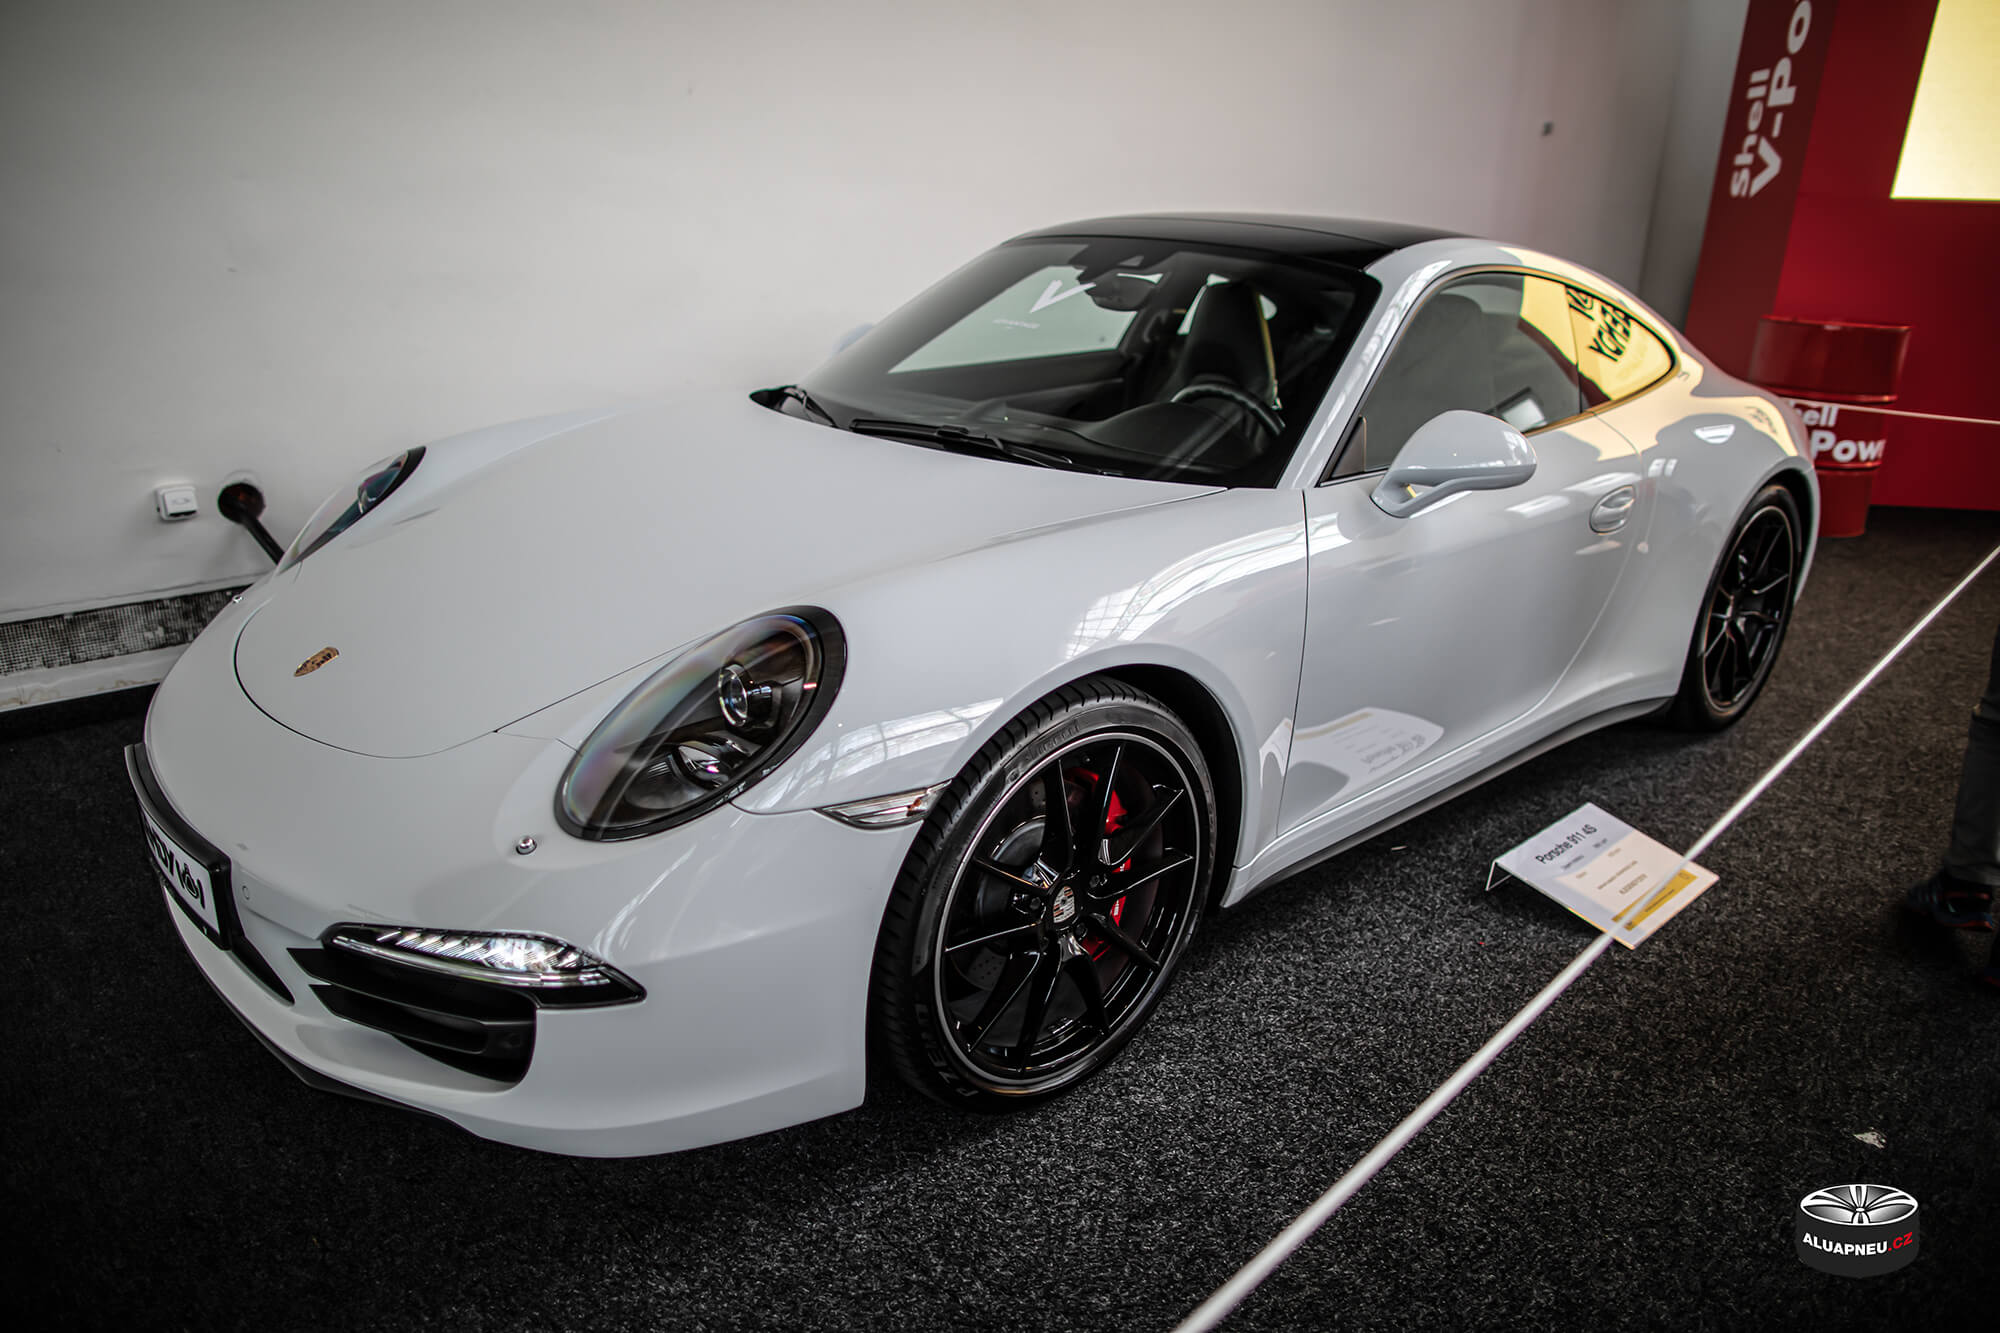 Černá alu kola Porsche - Automobilové Legendy 2019 - www.aluapneu.cz